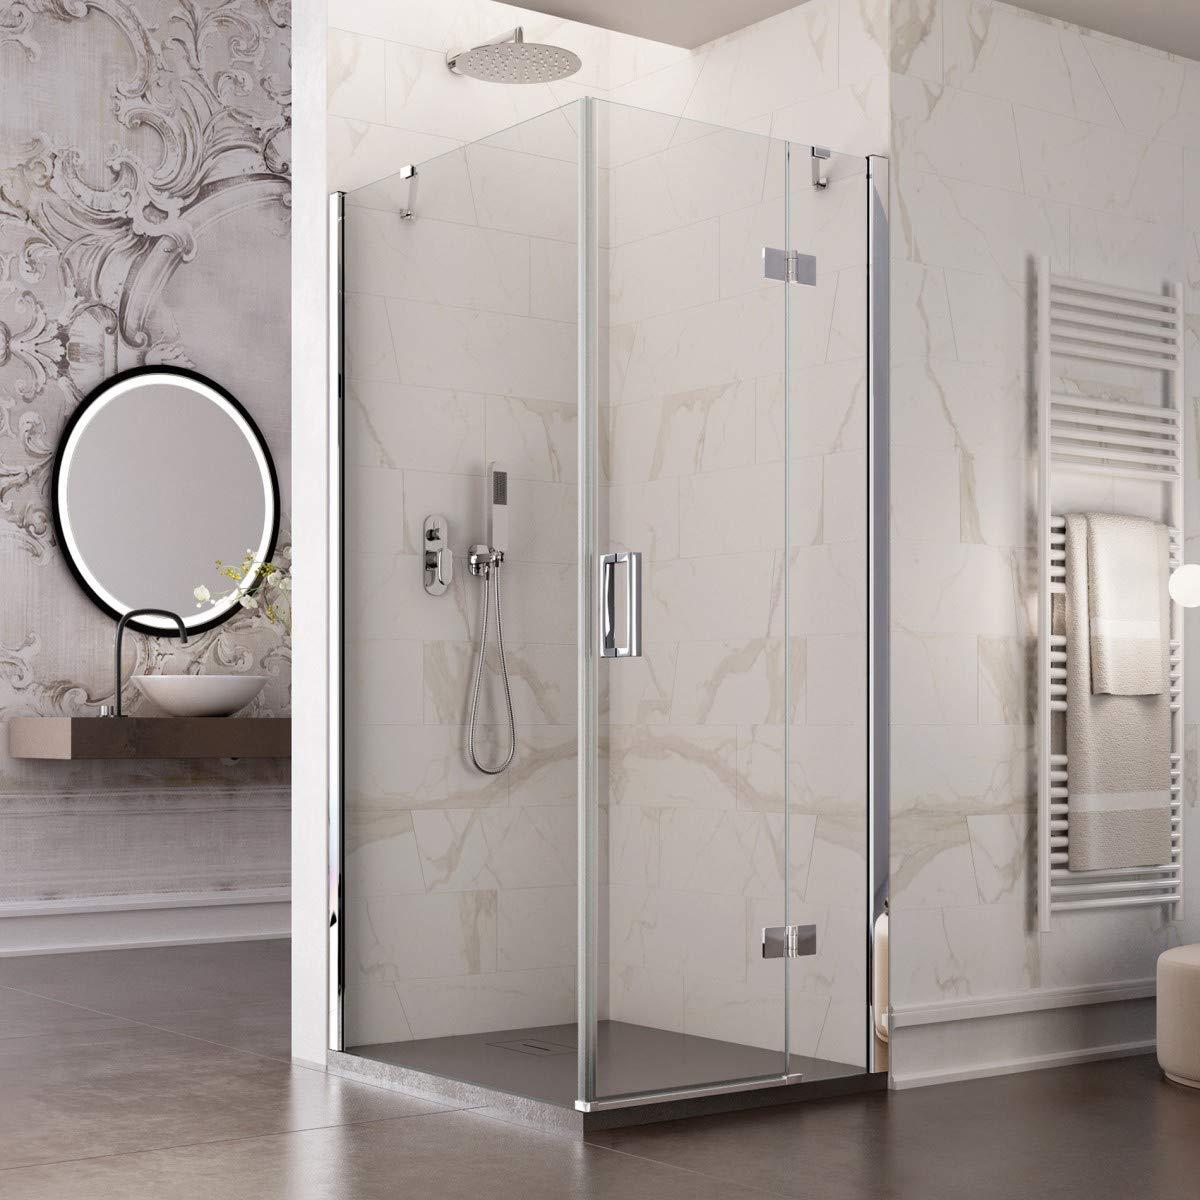 Olimpo duchas reg-100 X 80 ducha cabina sin perfiles Puerta ...